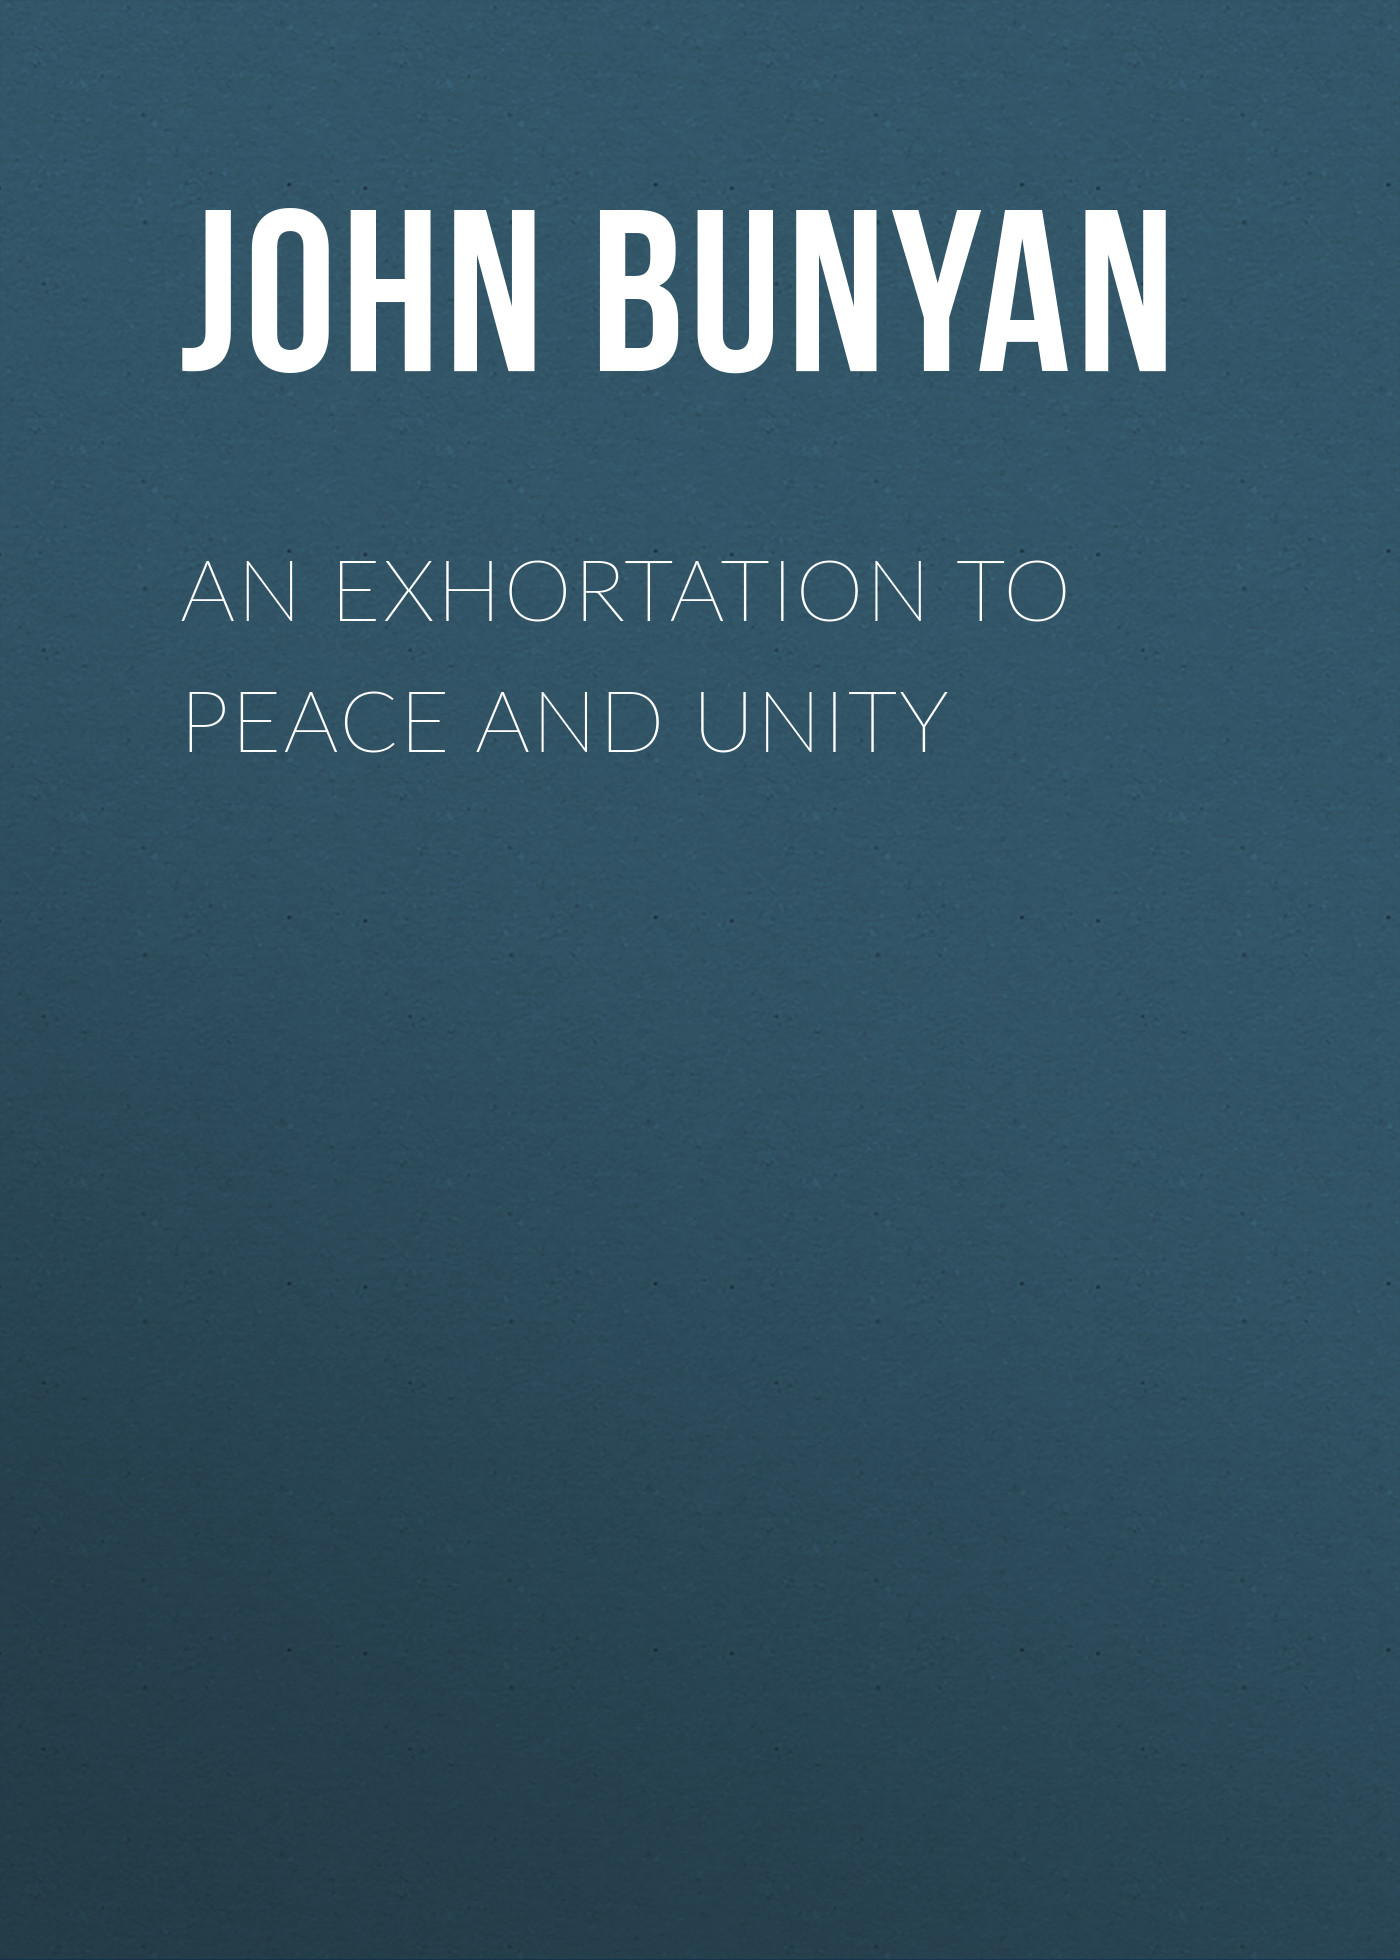 John Bunyan An Exhortation to Peace and Unity